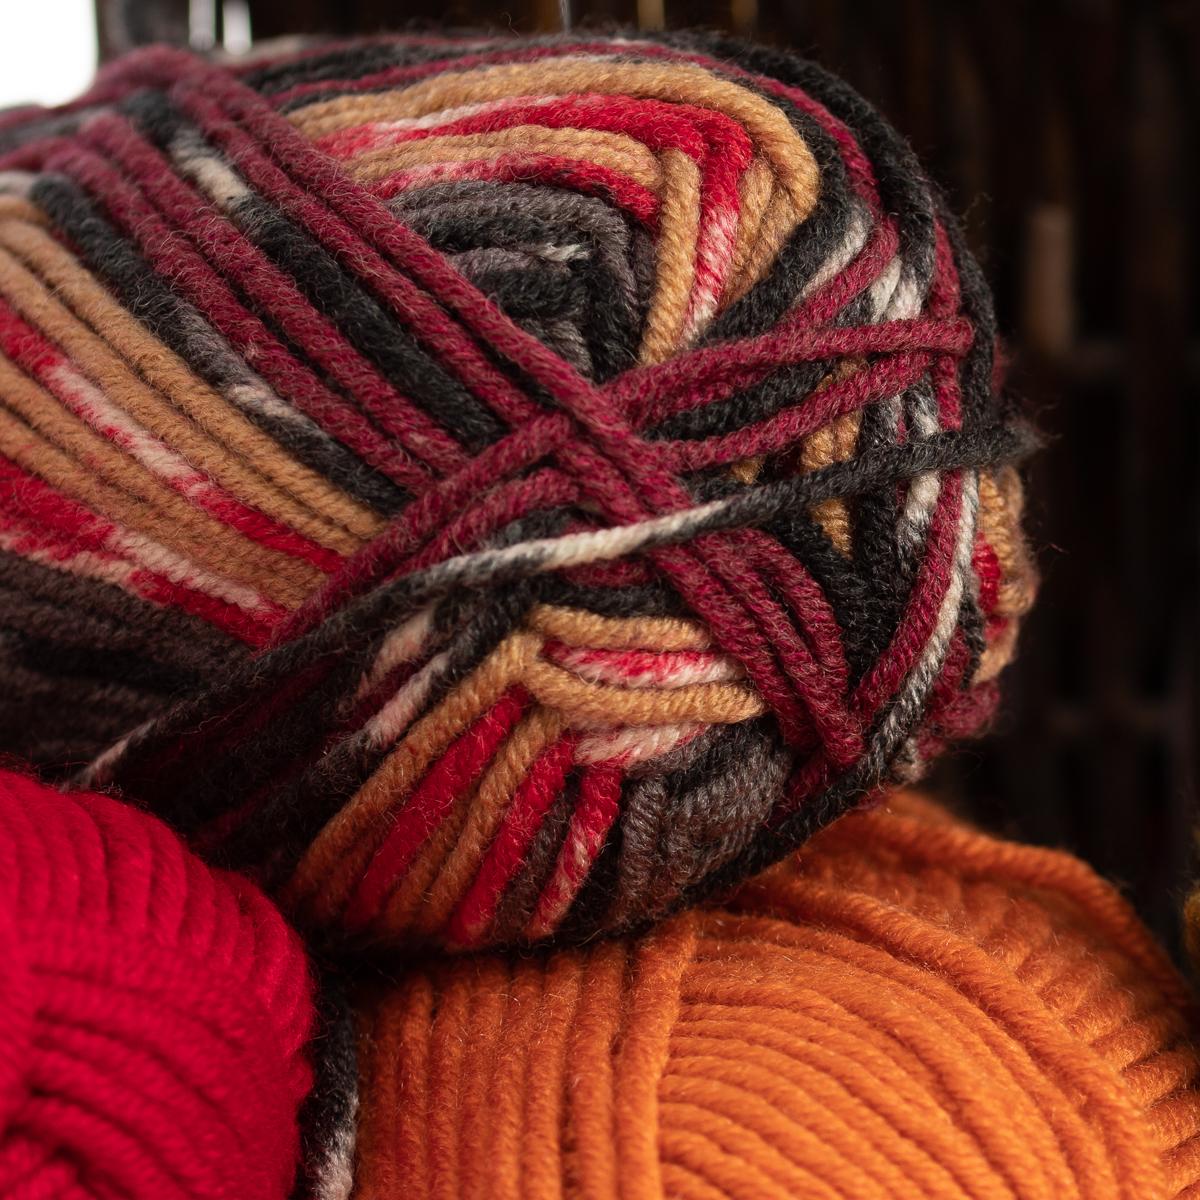 3pk-Lion-Brand-Woolspun-Acrylic-amp-Wool-Yarn-Bulky-5-Knit-Crocheting-Skeins-Soft thumbnail 22